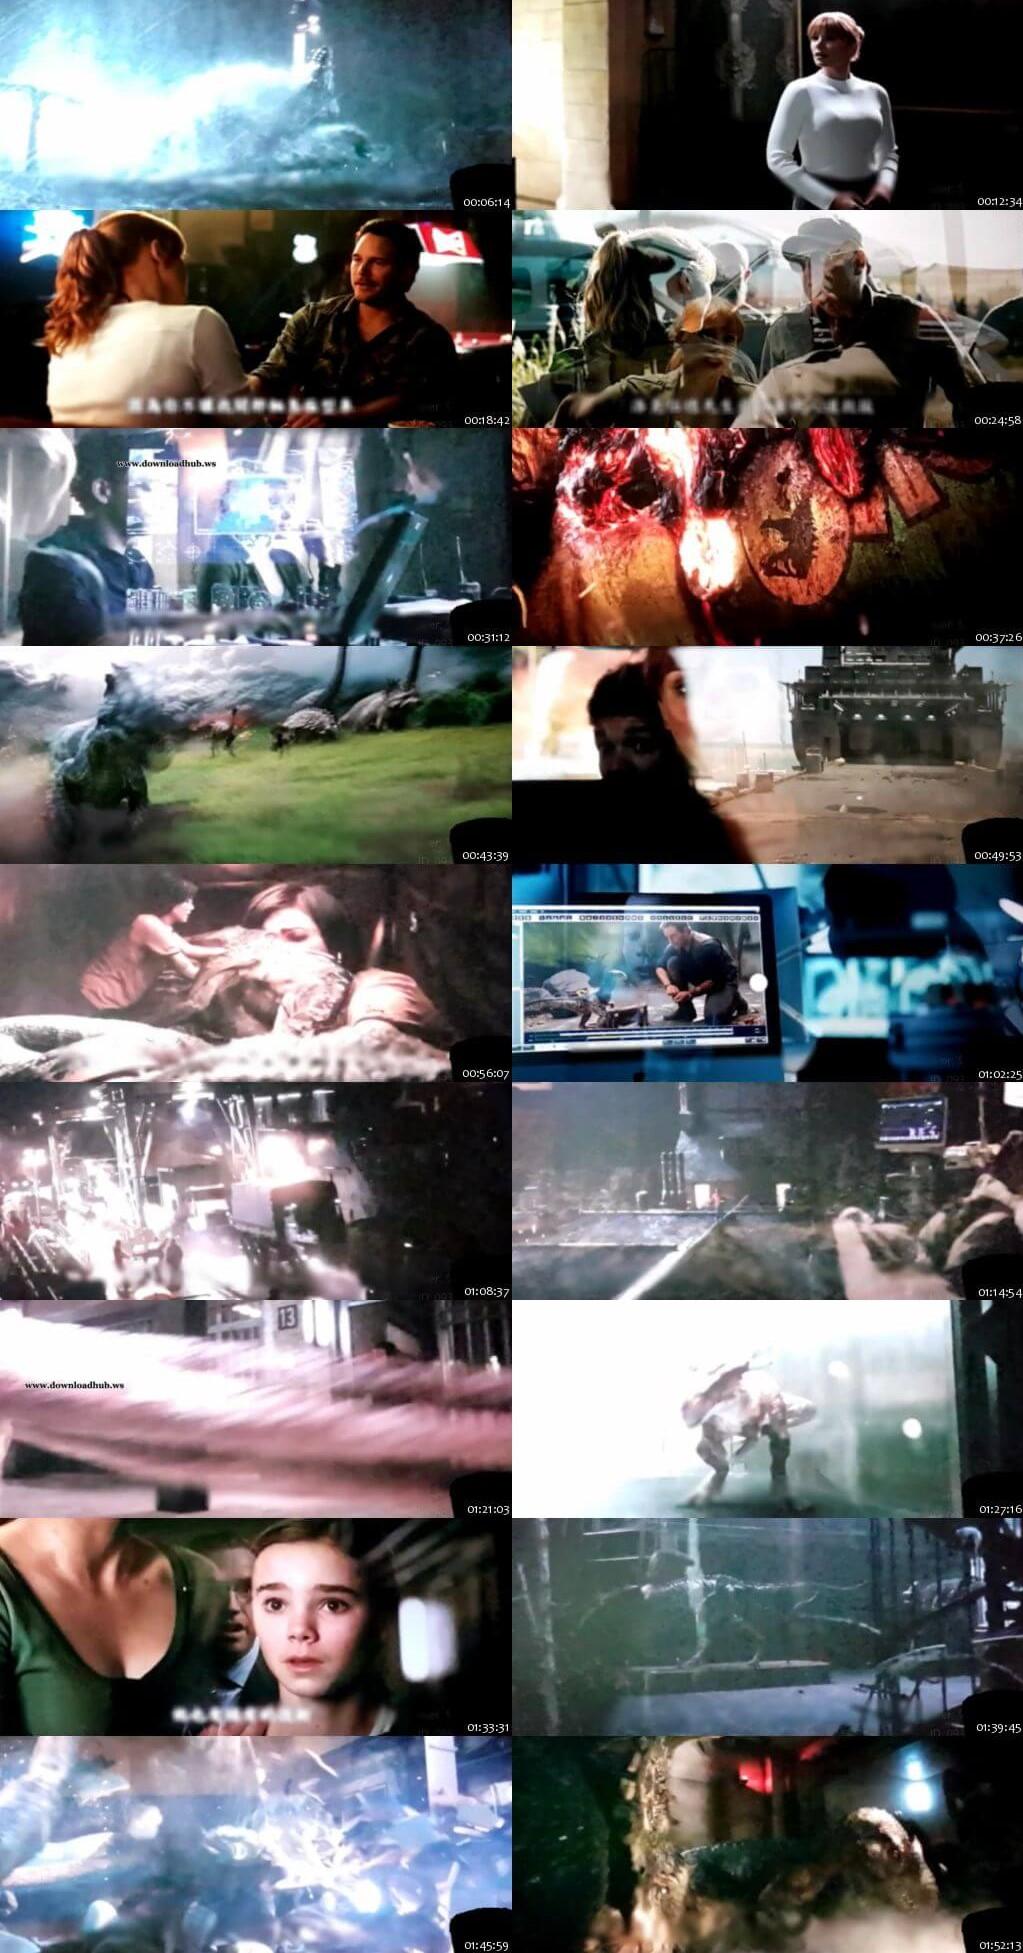 Jurassic World Fallen Kingdom (2018) 720p HDCAM Dual Audio [Hindi(Cam) + English] x264 Full Movie Free Download HD